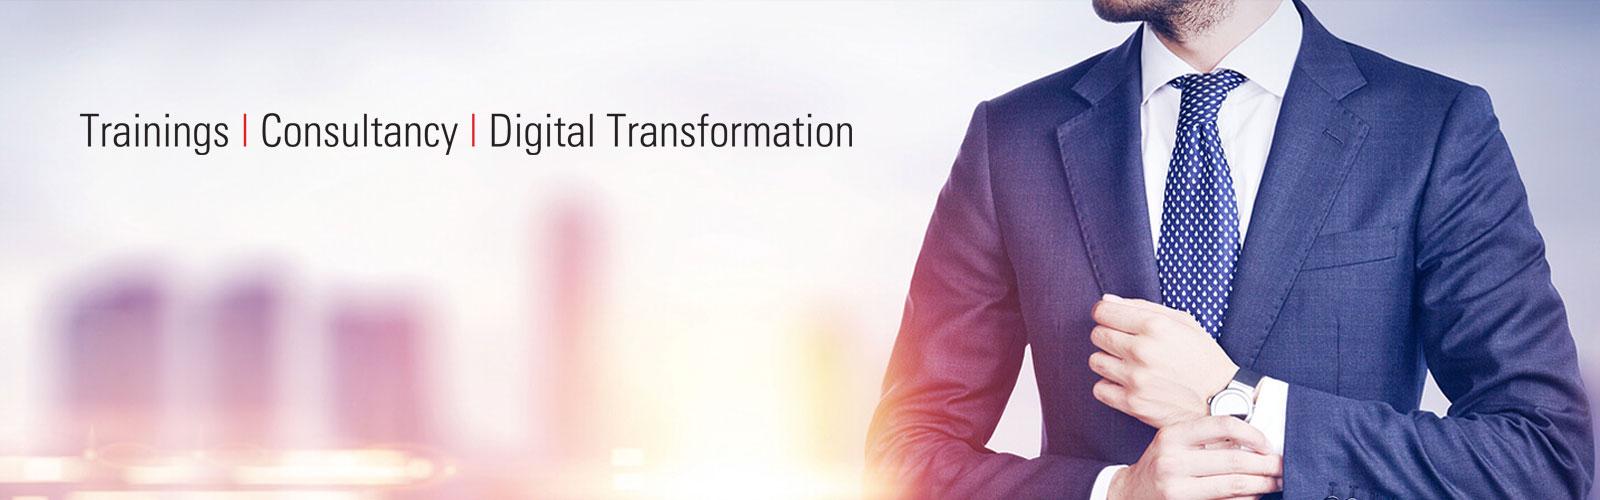 Octara – TCS | Trainings, Consultancy, Digitalization